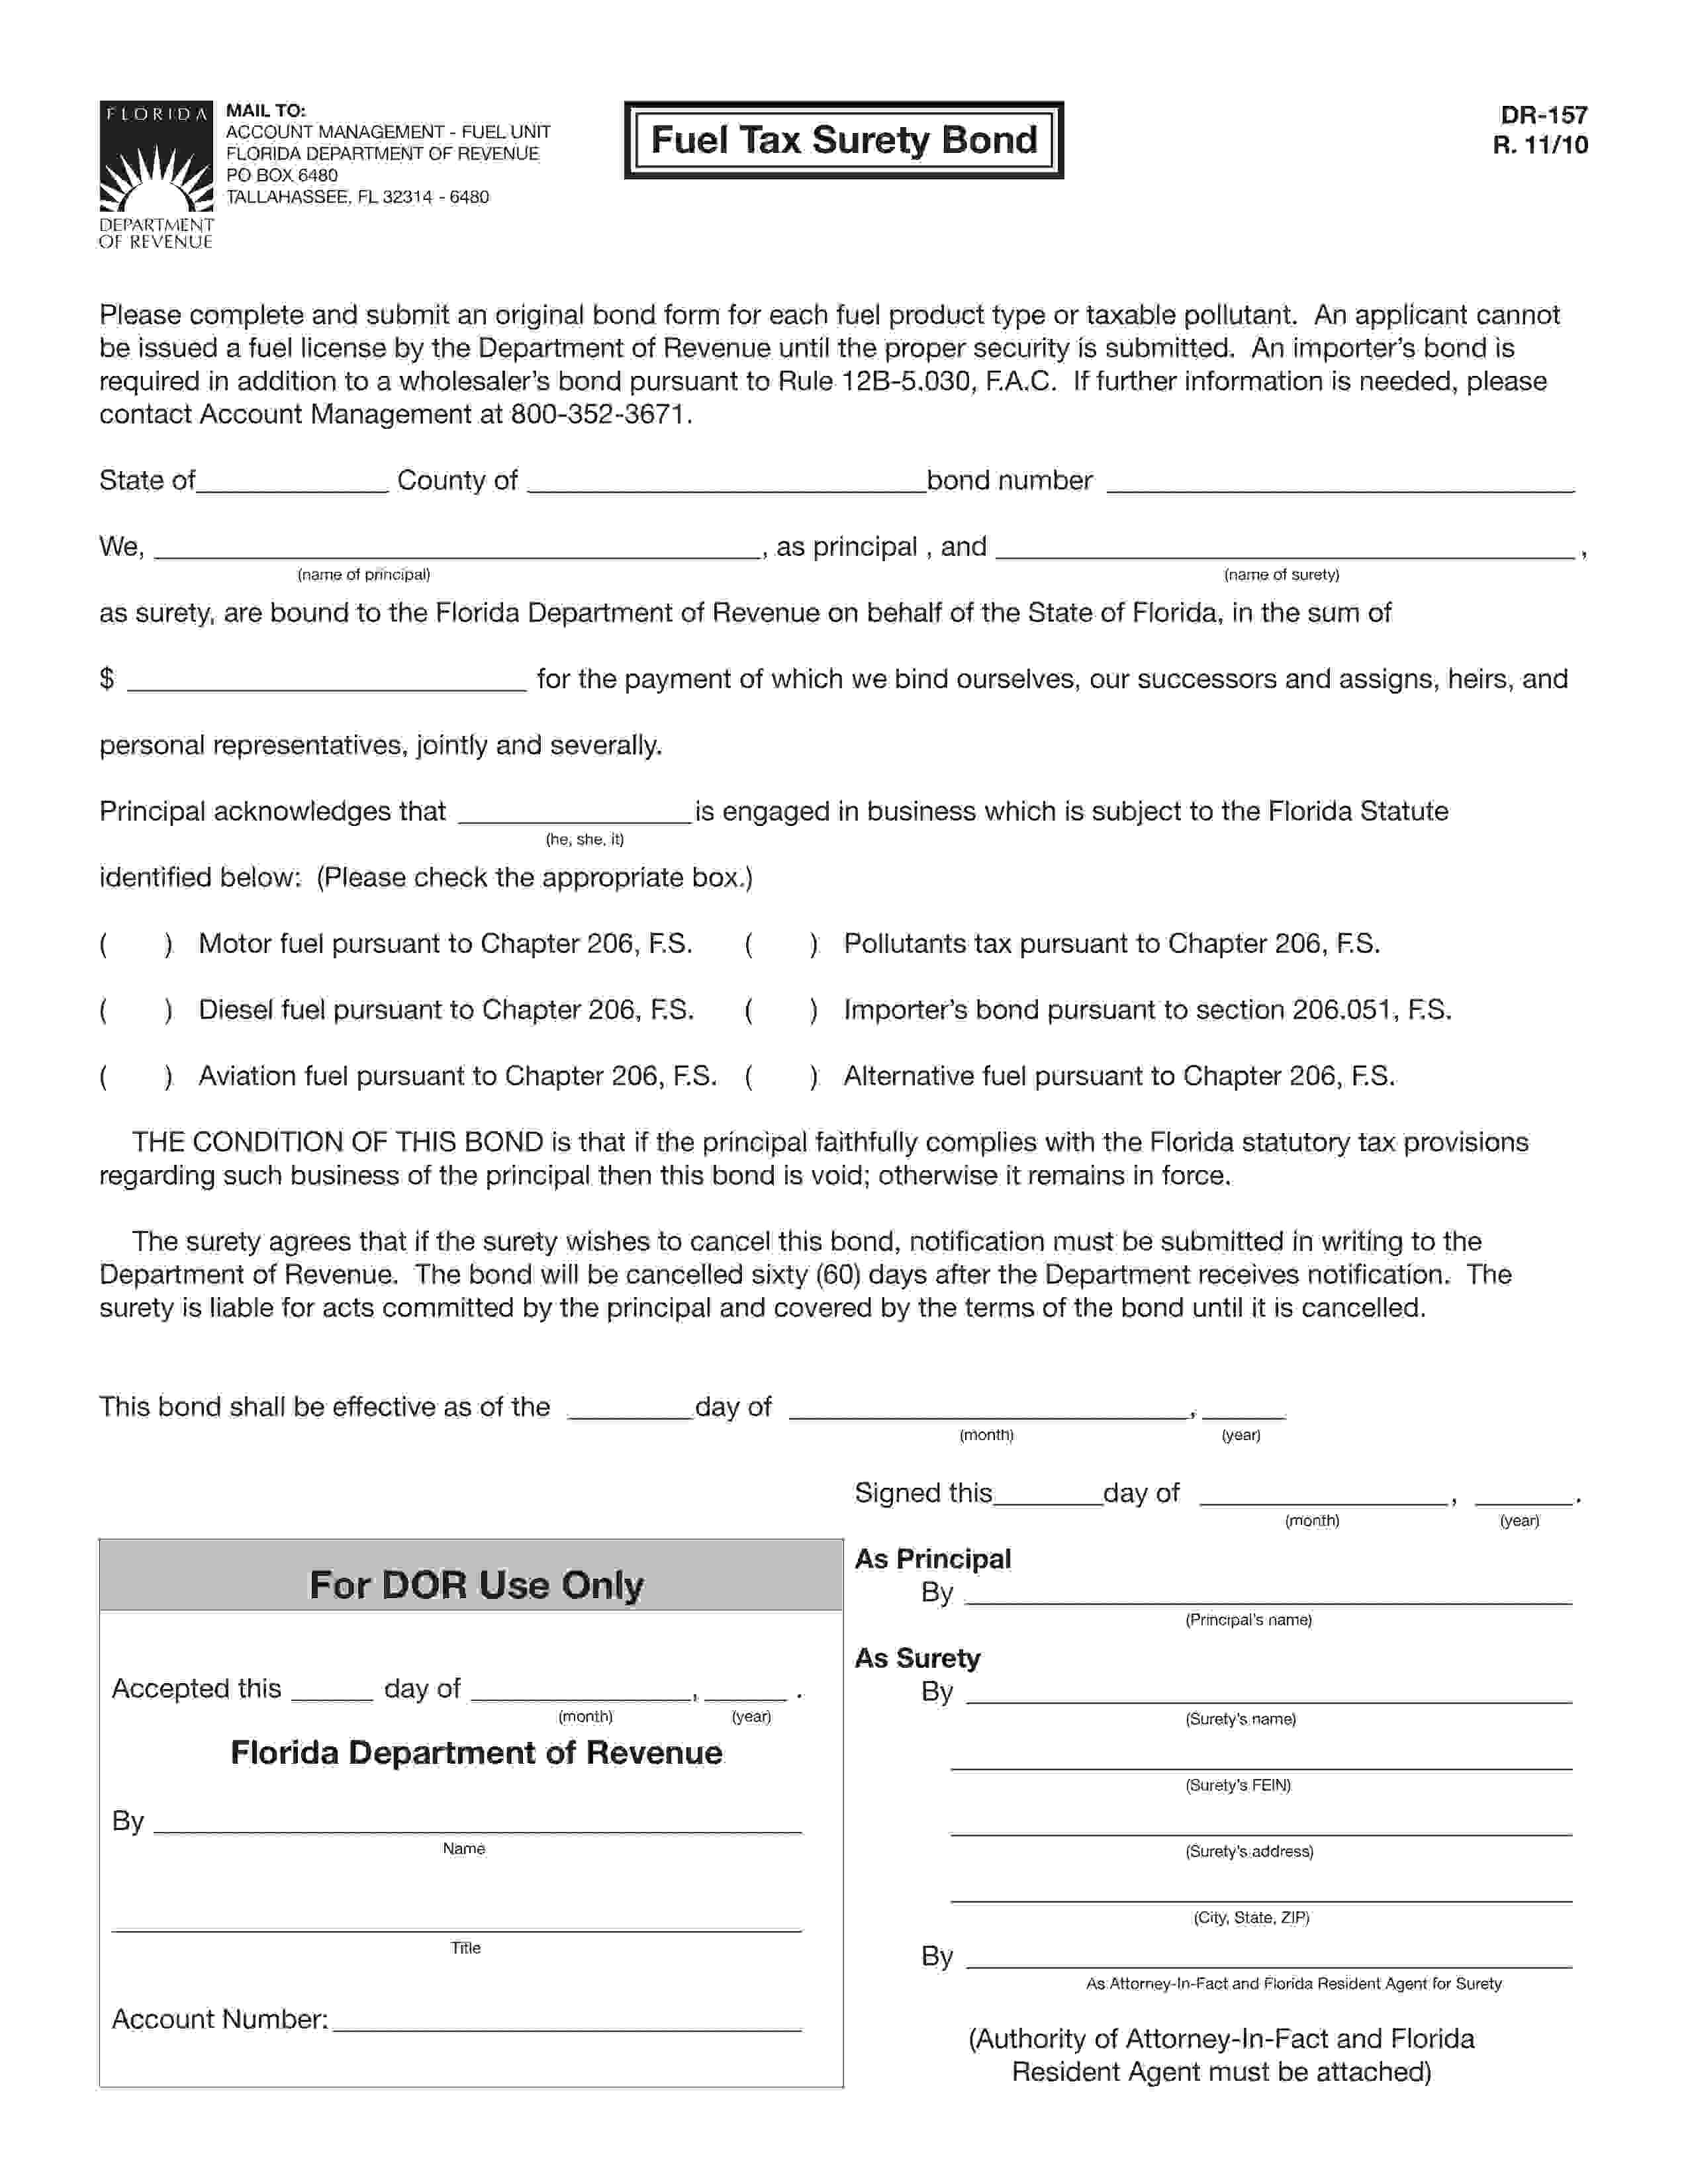 Florida Department Of Revenue, Fuel Unit Fuel Tax: Aviation Fuel Bond sample image